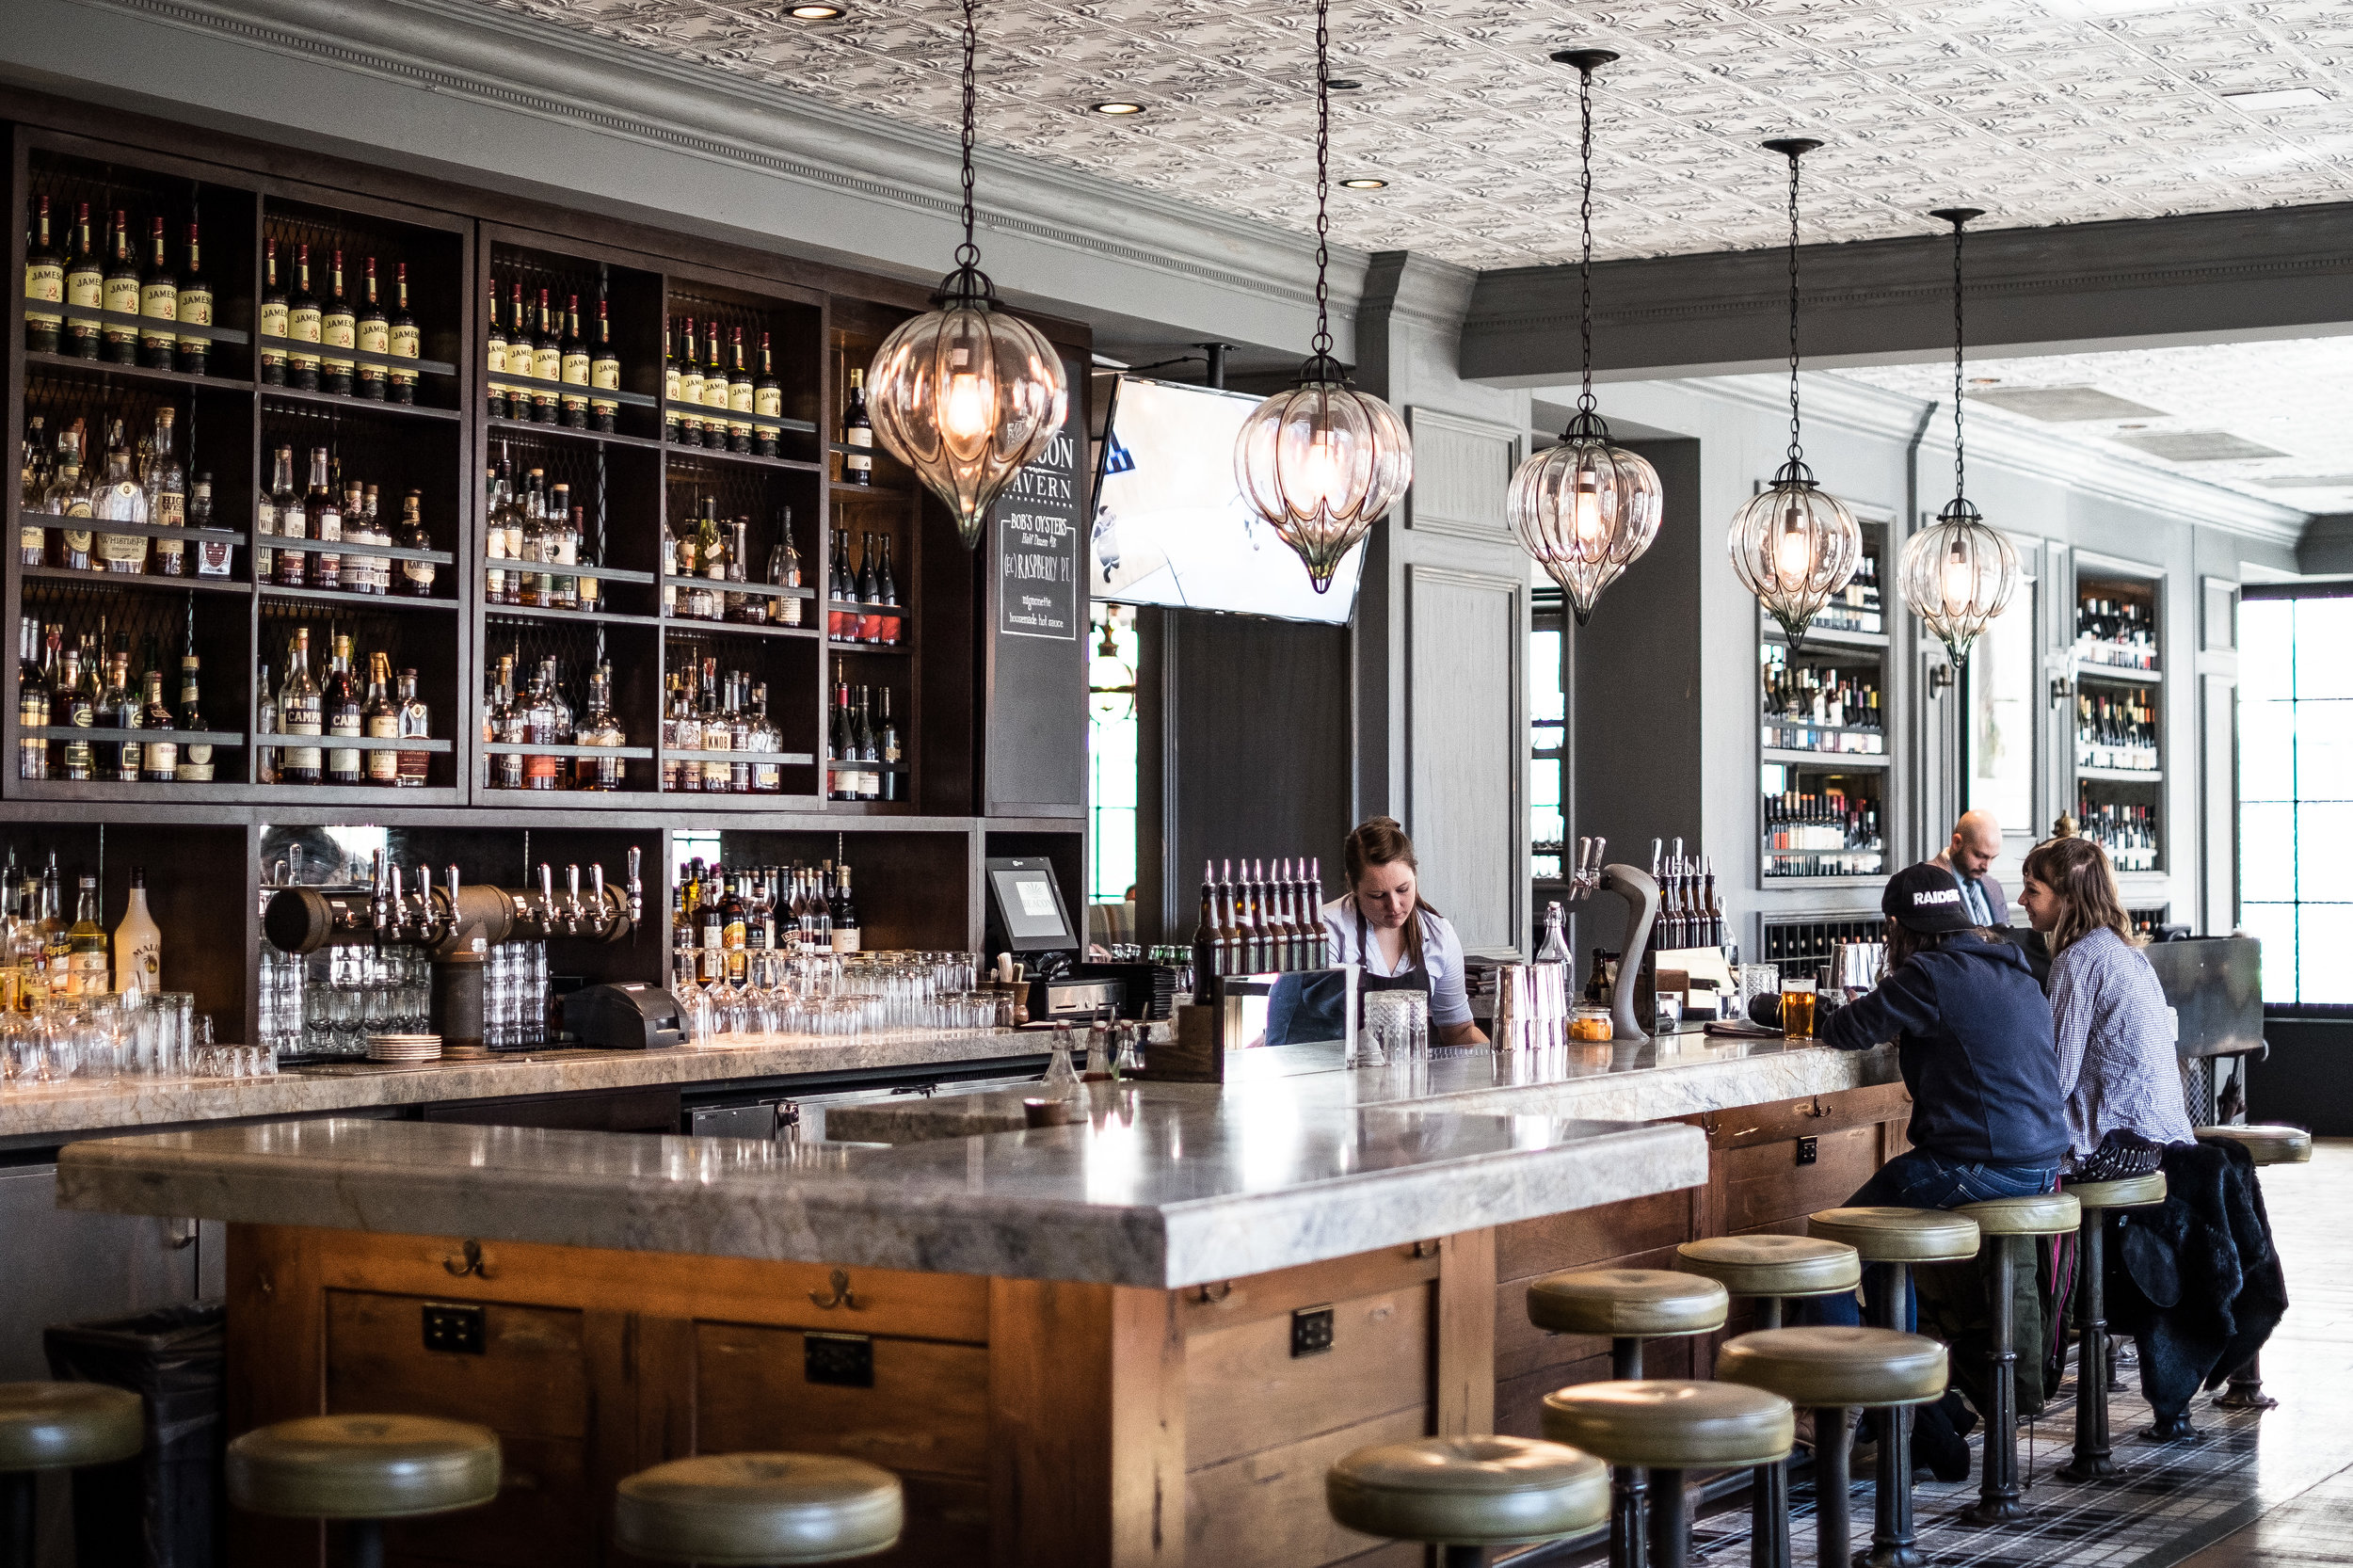 Beacon Tavern Chicago IL 2017 Olivia Vranjes-3.jpg